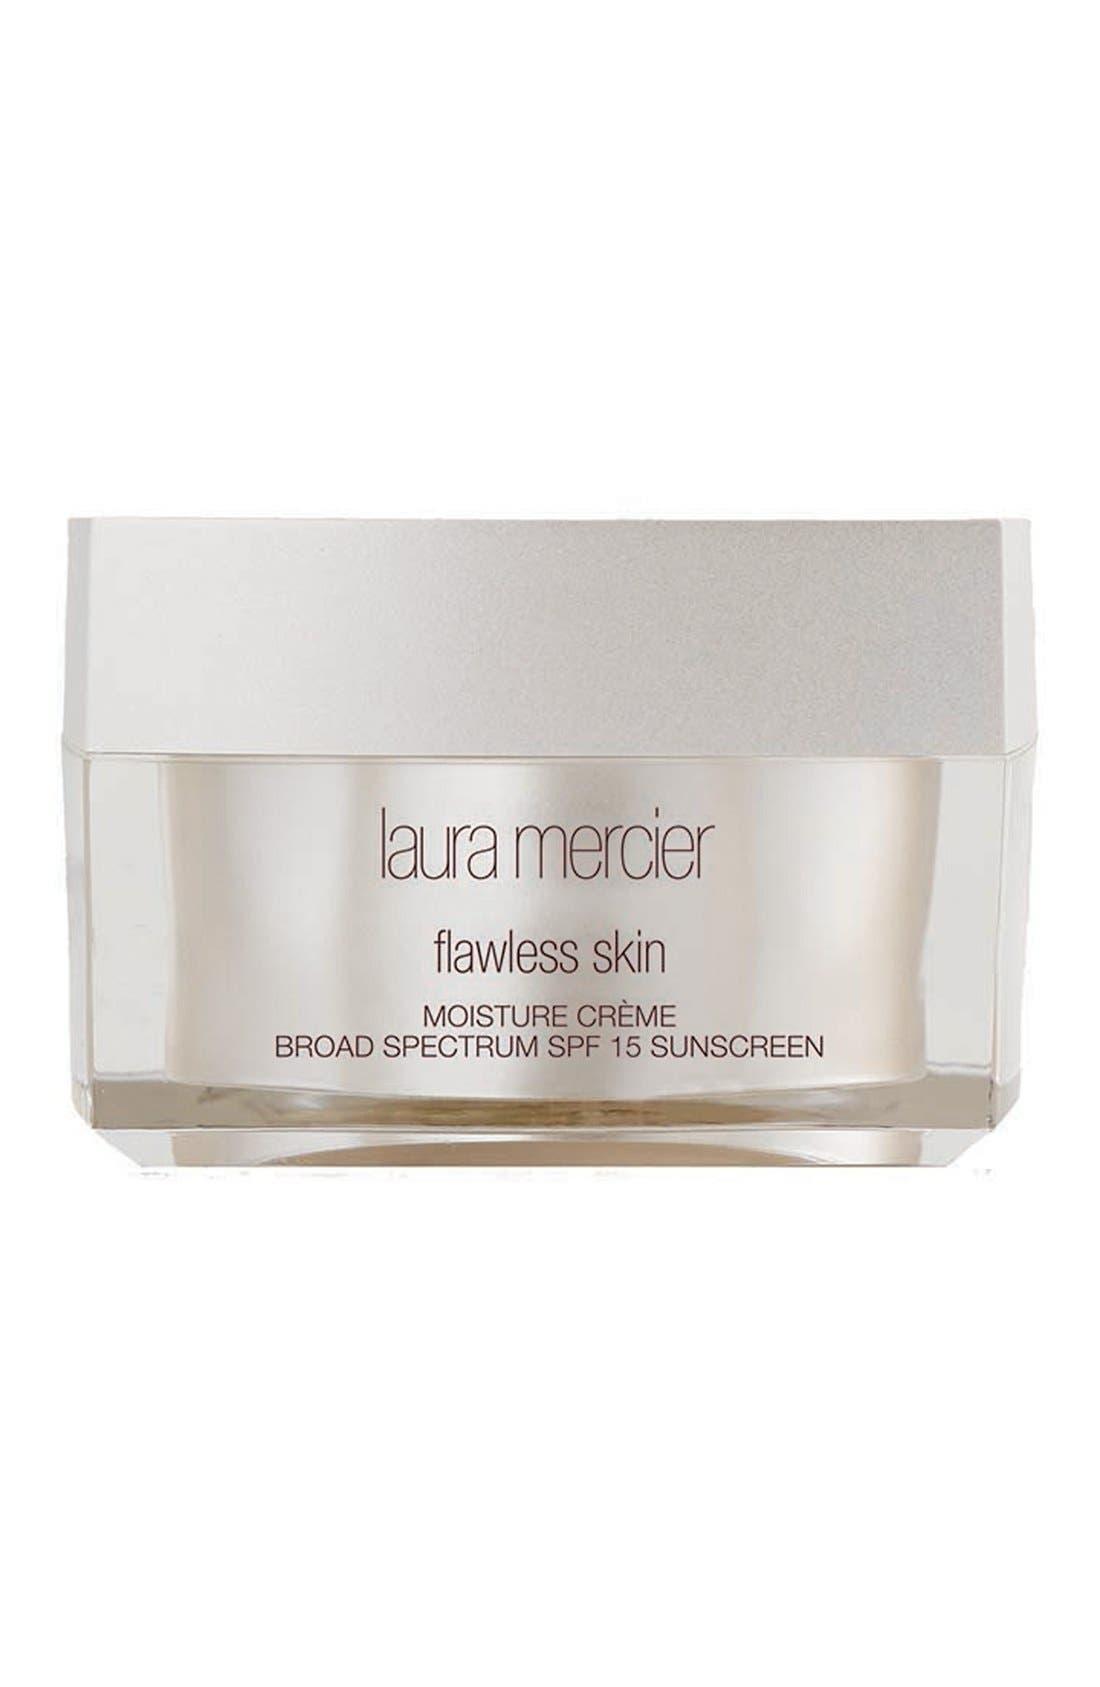 LAURA MERCIER 'Flawless Skin' Moisture Crème Broad Spectrum SPF 15, Main, color, 000